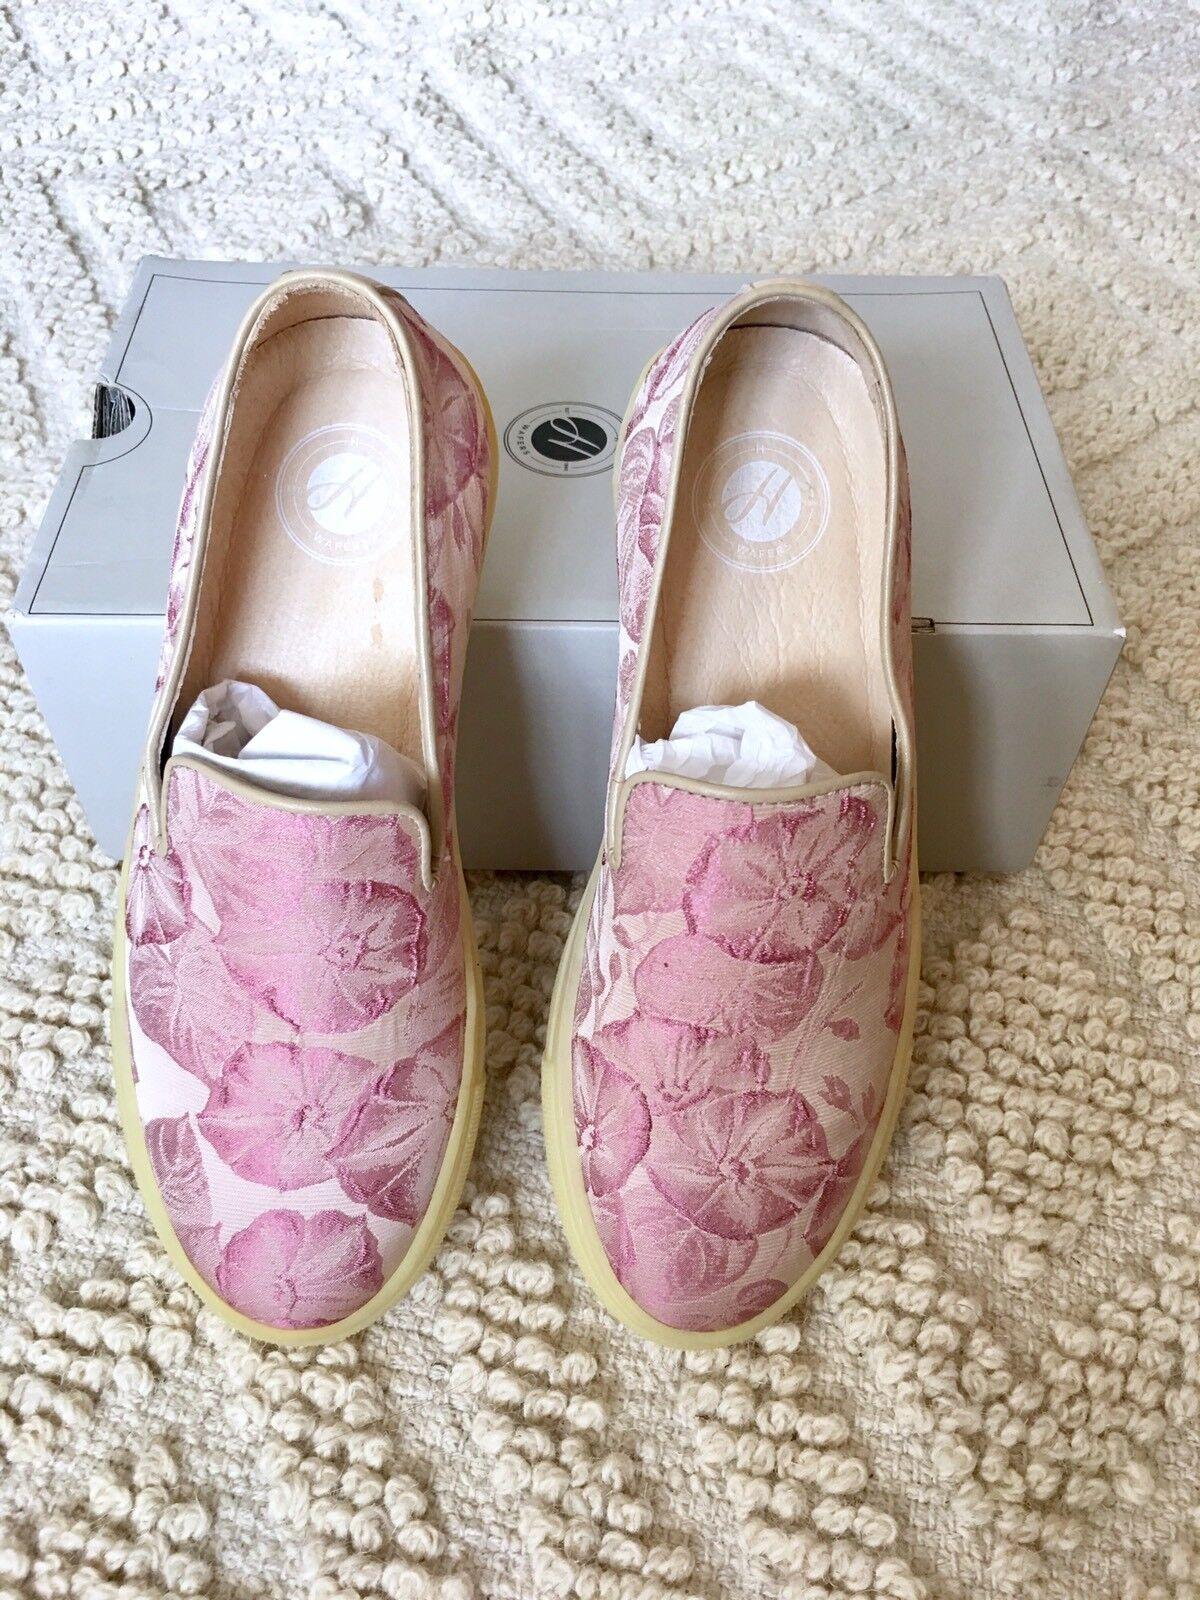 BNIB H by HUDSON ANNUK Pink Floral Slip On PLIMSOLLS PLIMSOLLS On FLATS 38 5 fb1073